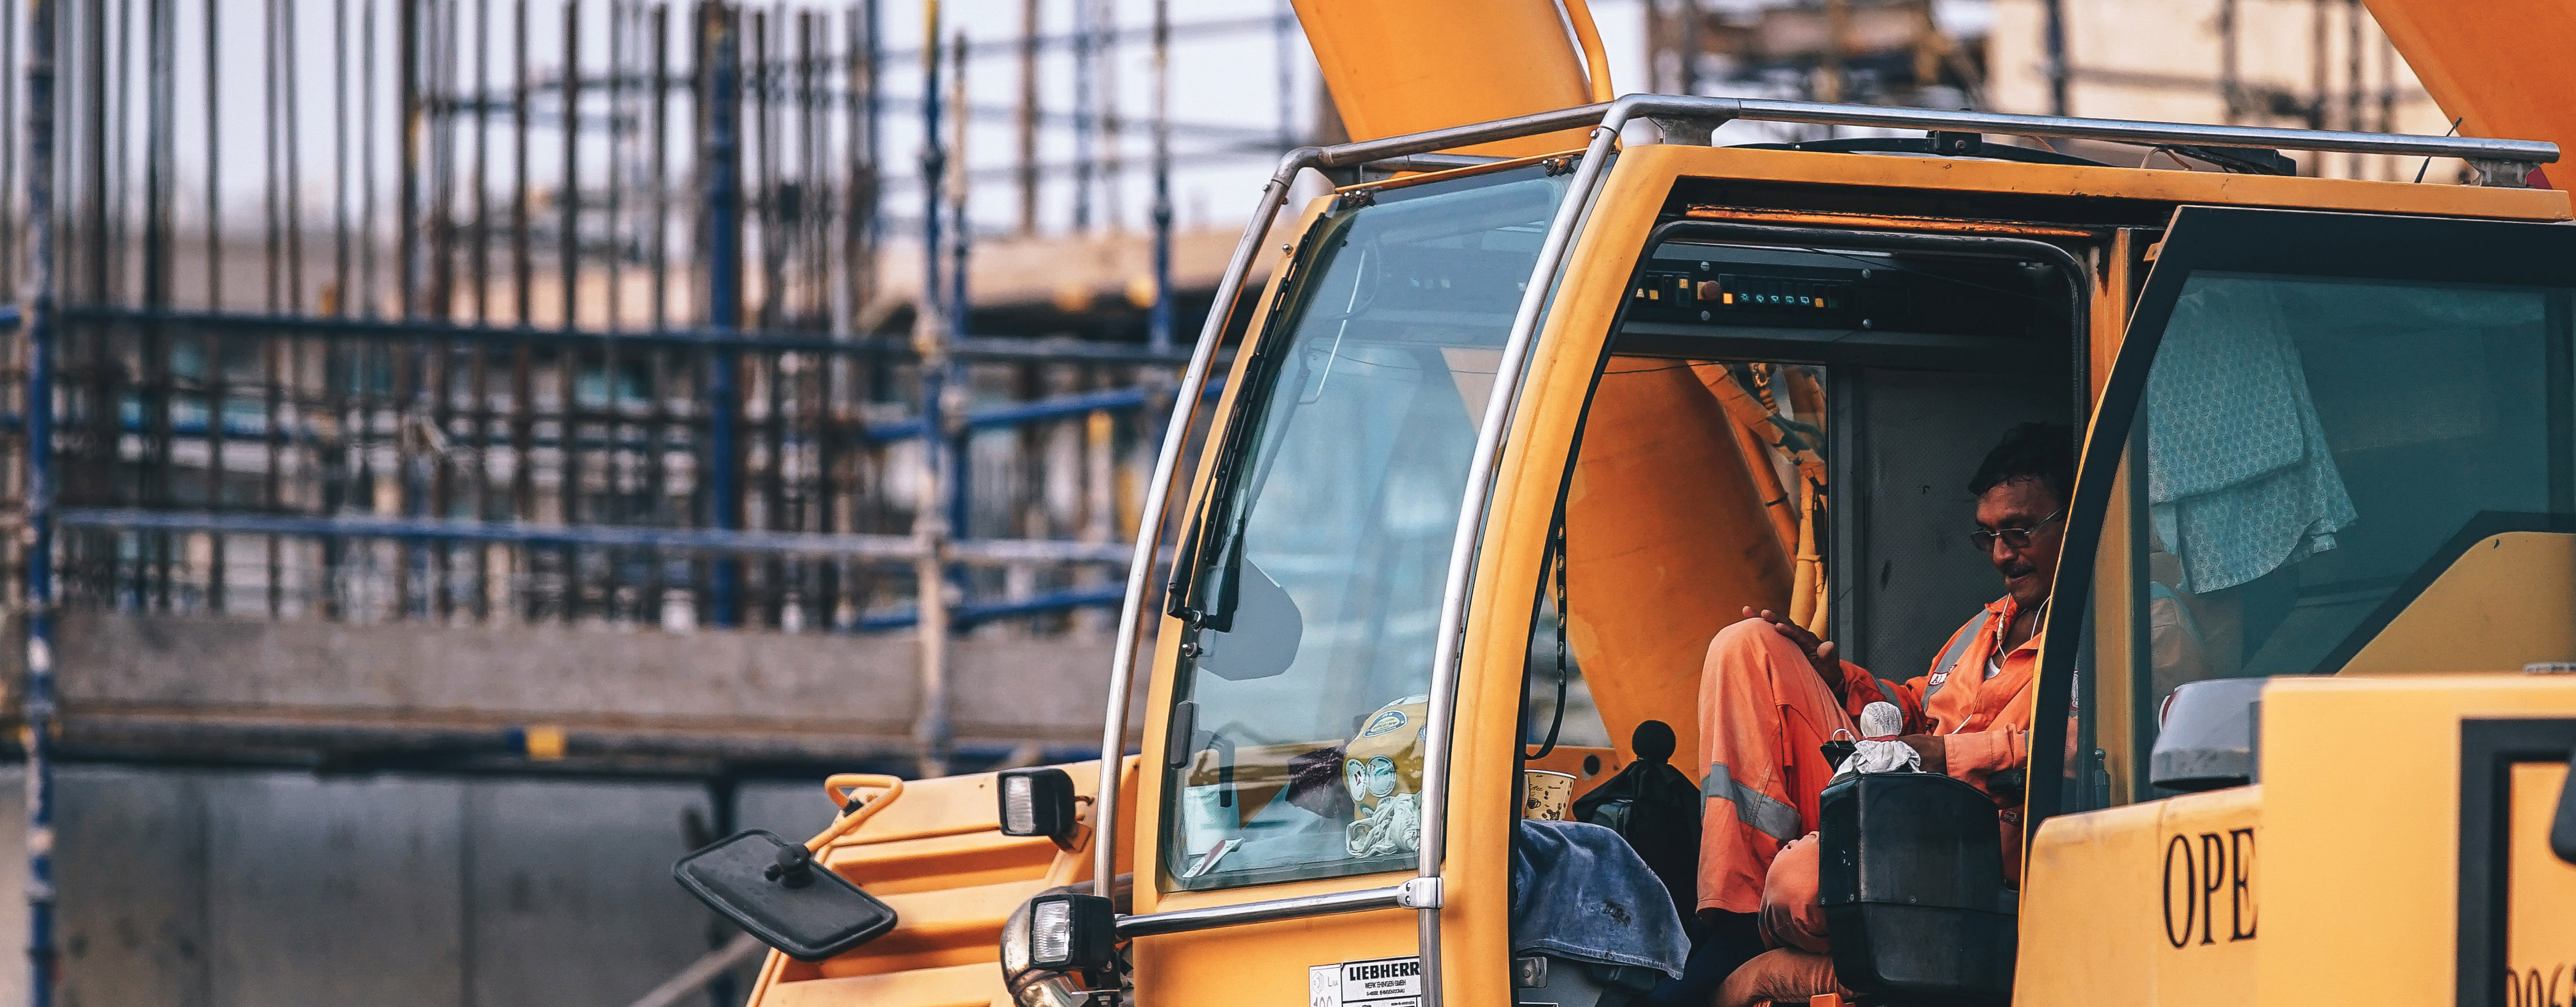 Construction Equipment Best Practices